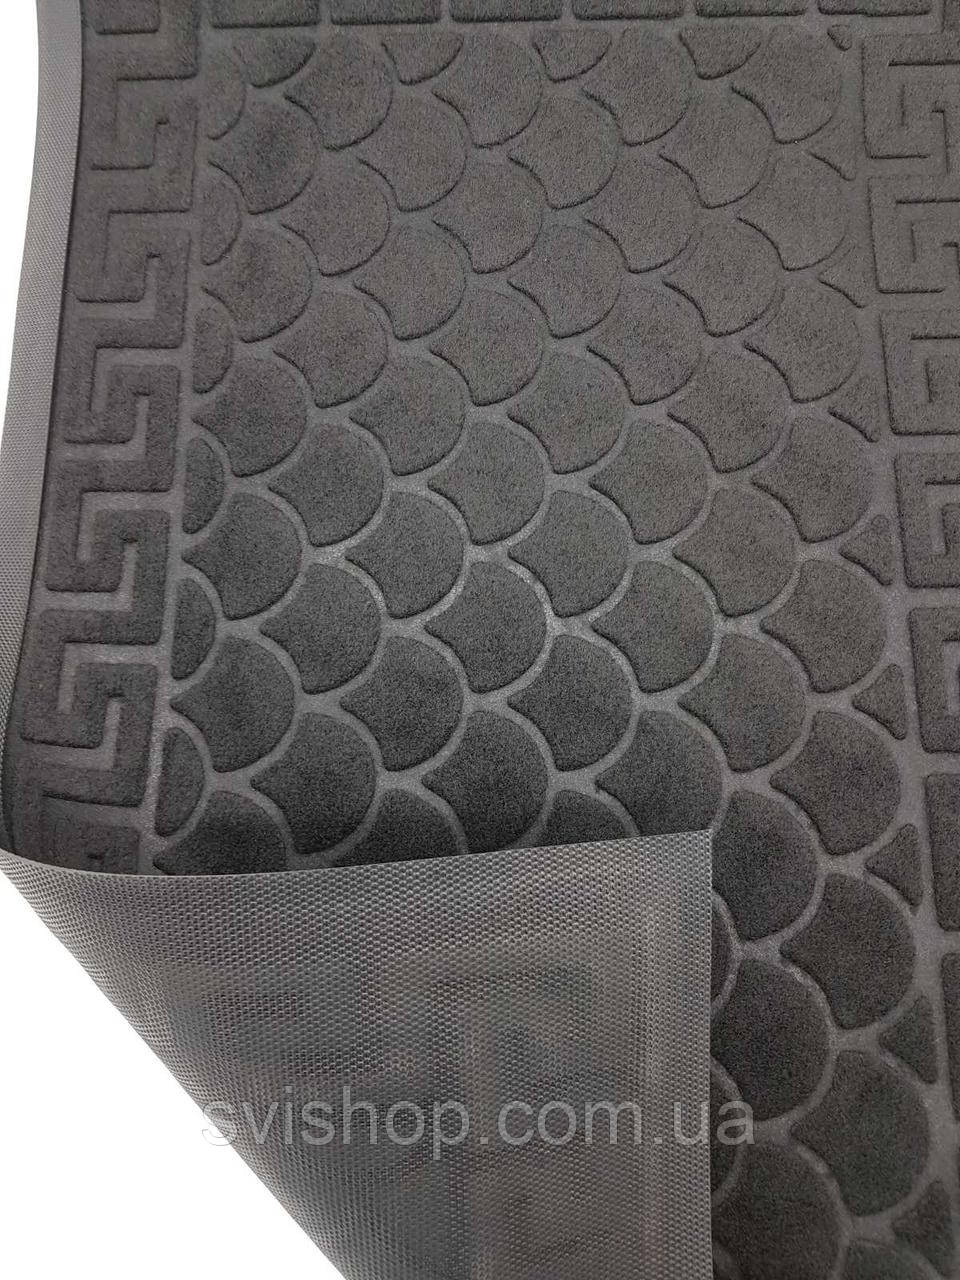 Придверний килимок 45х75см.чорний.